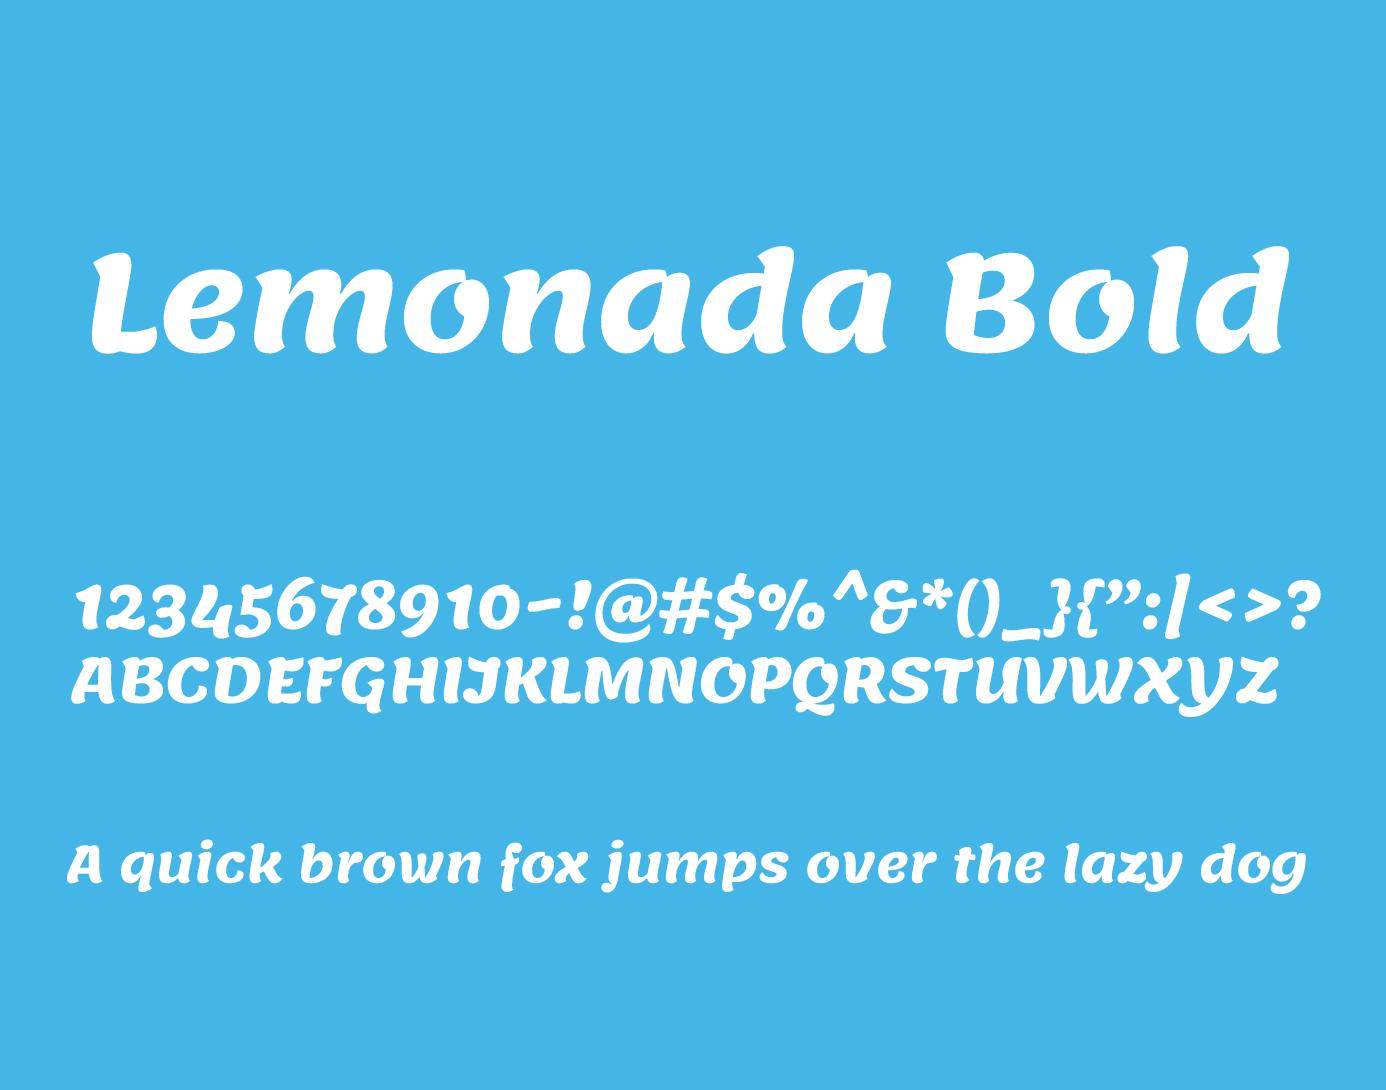 lemonada bold